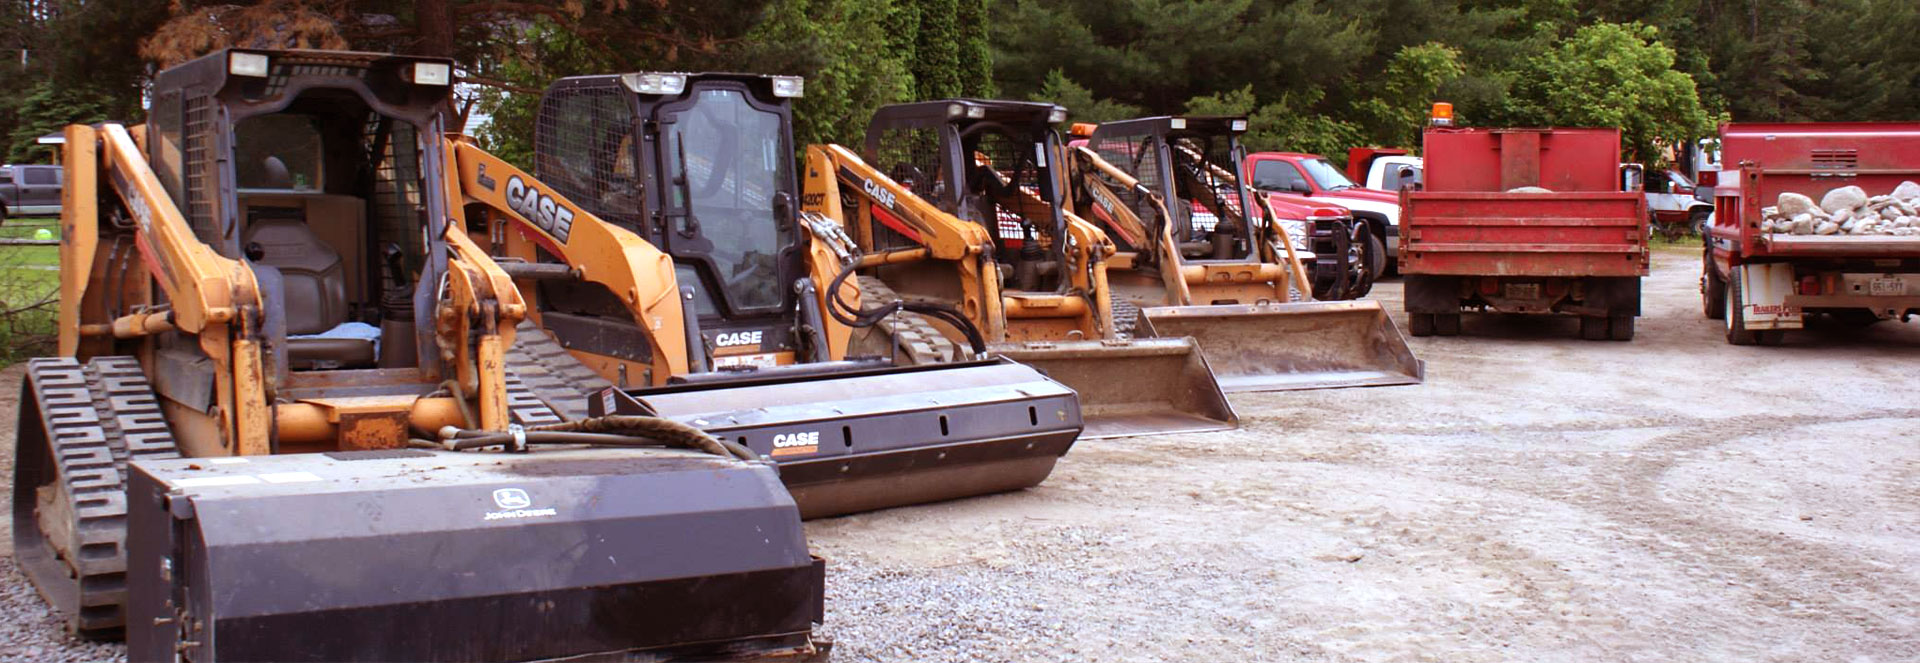 Our fleet of equipment